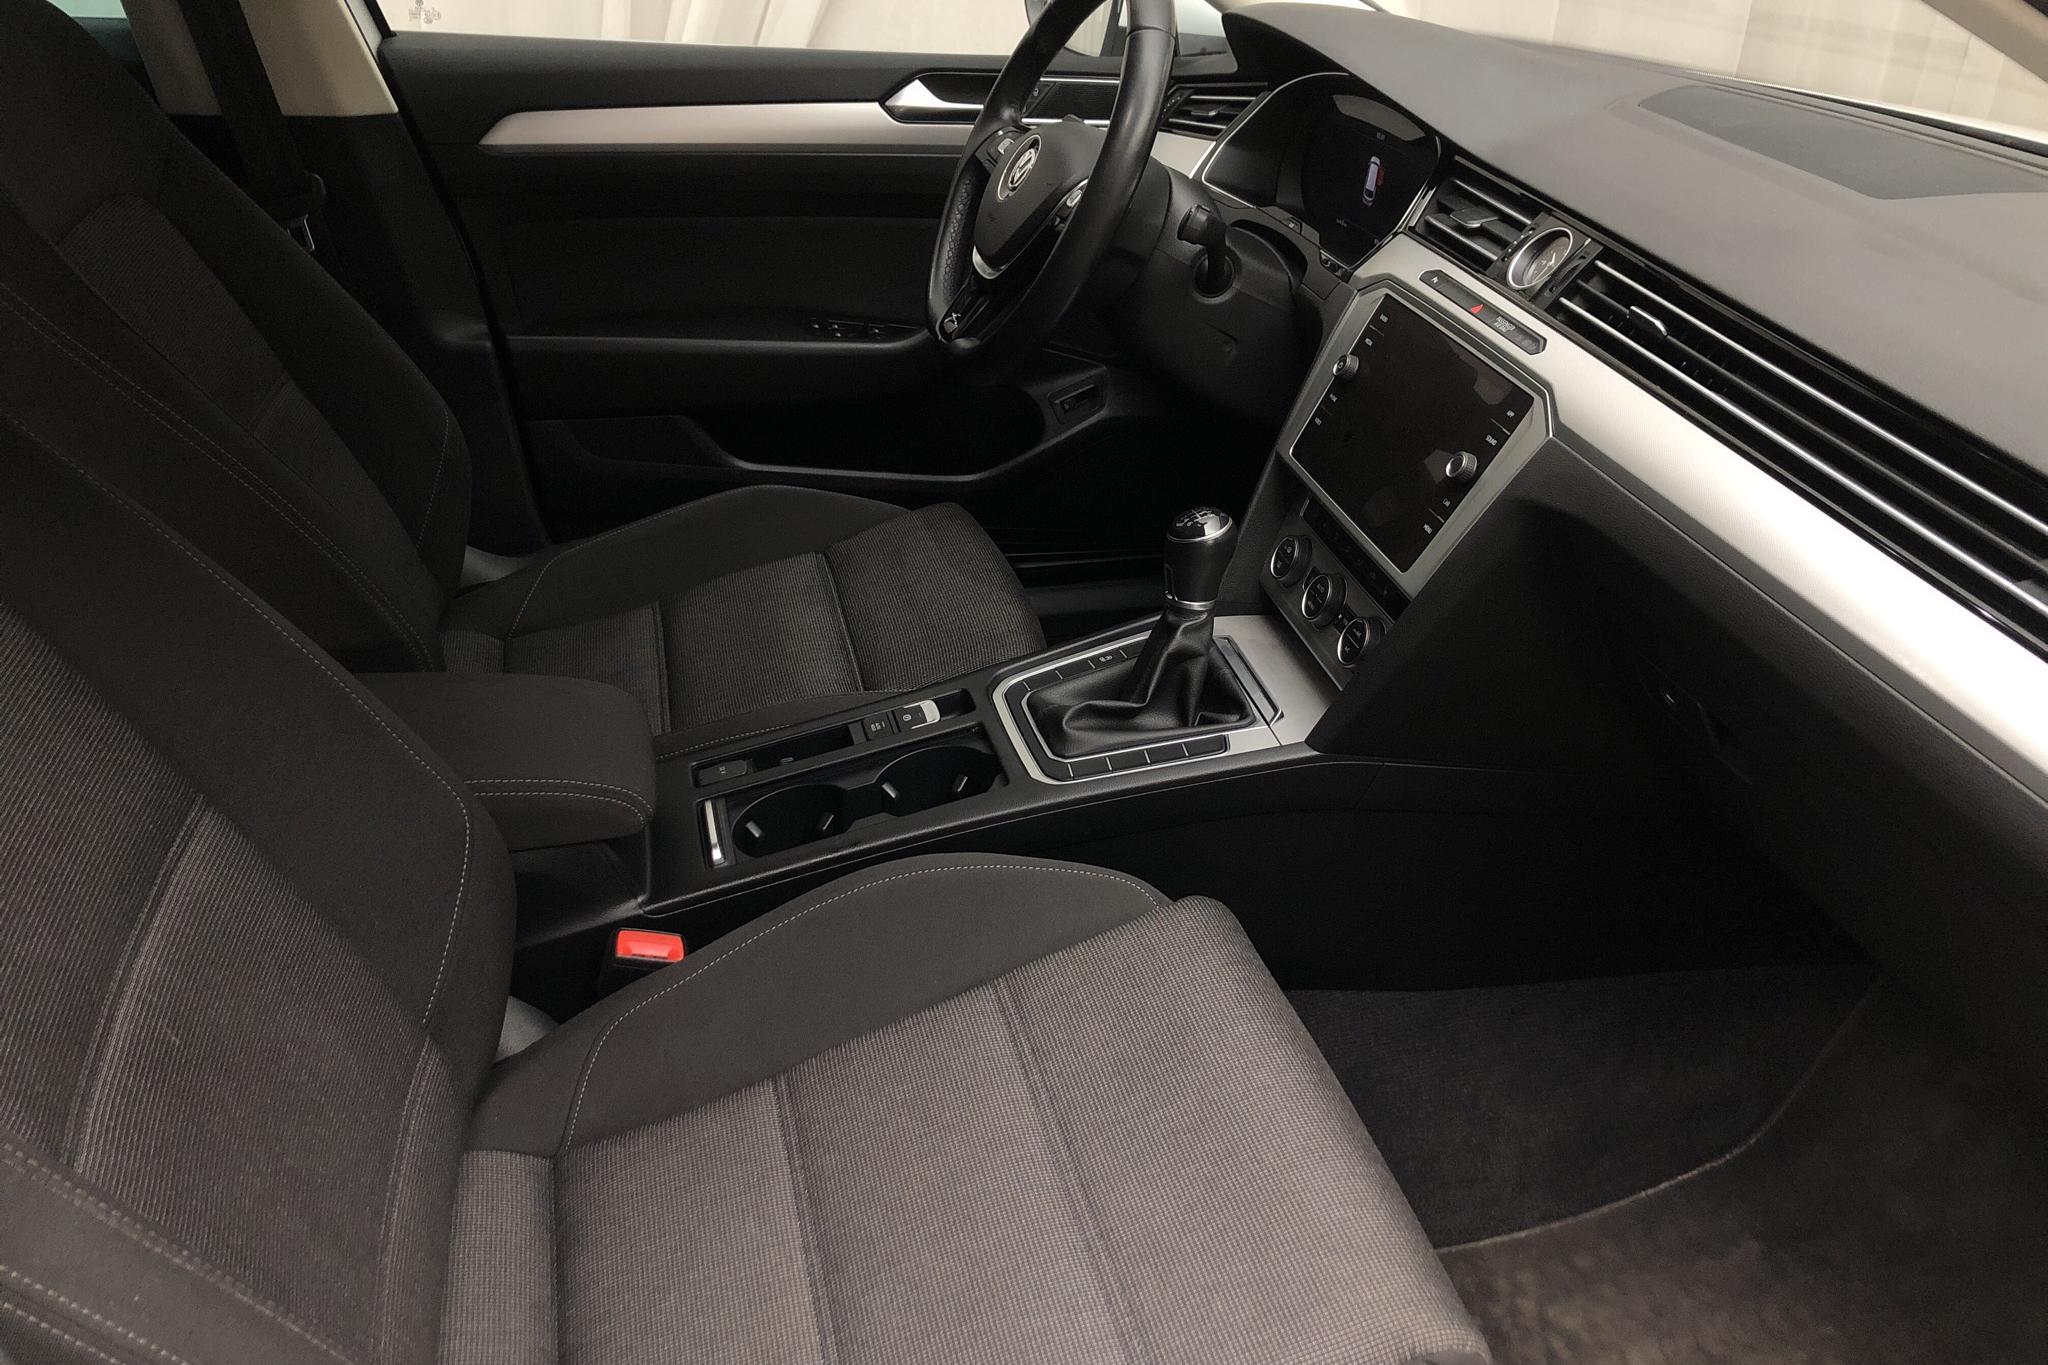 VW Passat 1.4 TSI Sportscombi (150hk) - 8 348 mil - Manuell - vit - 2018